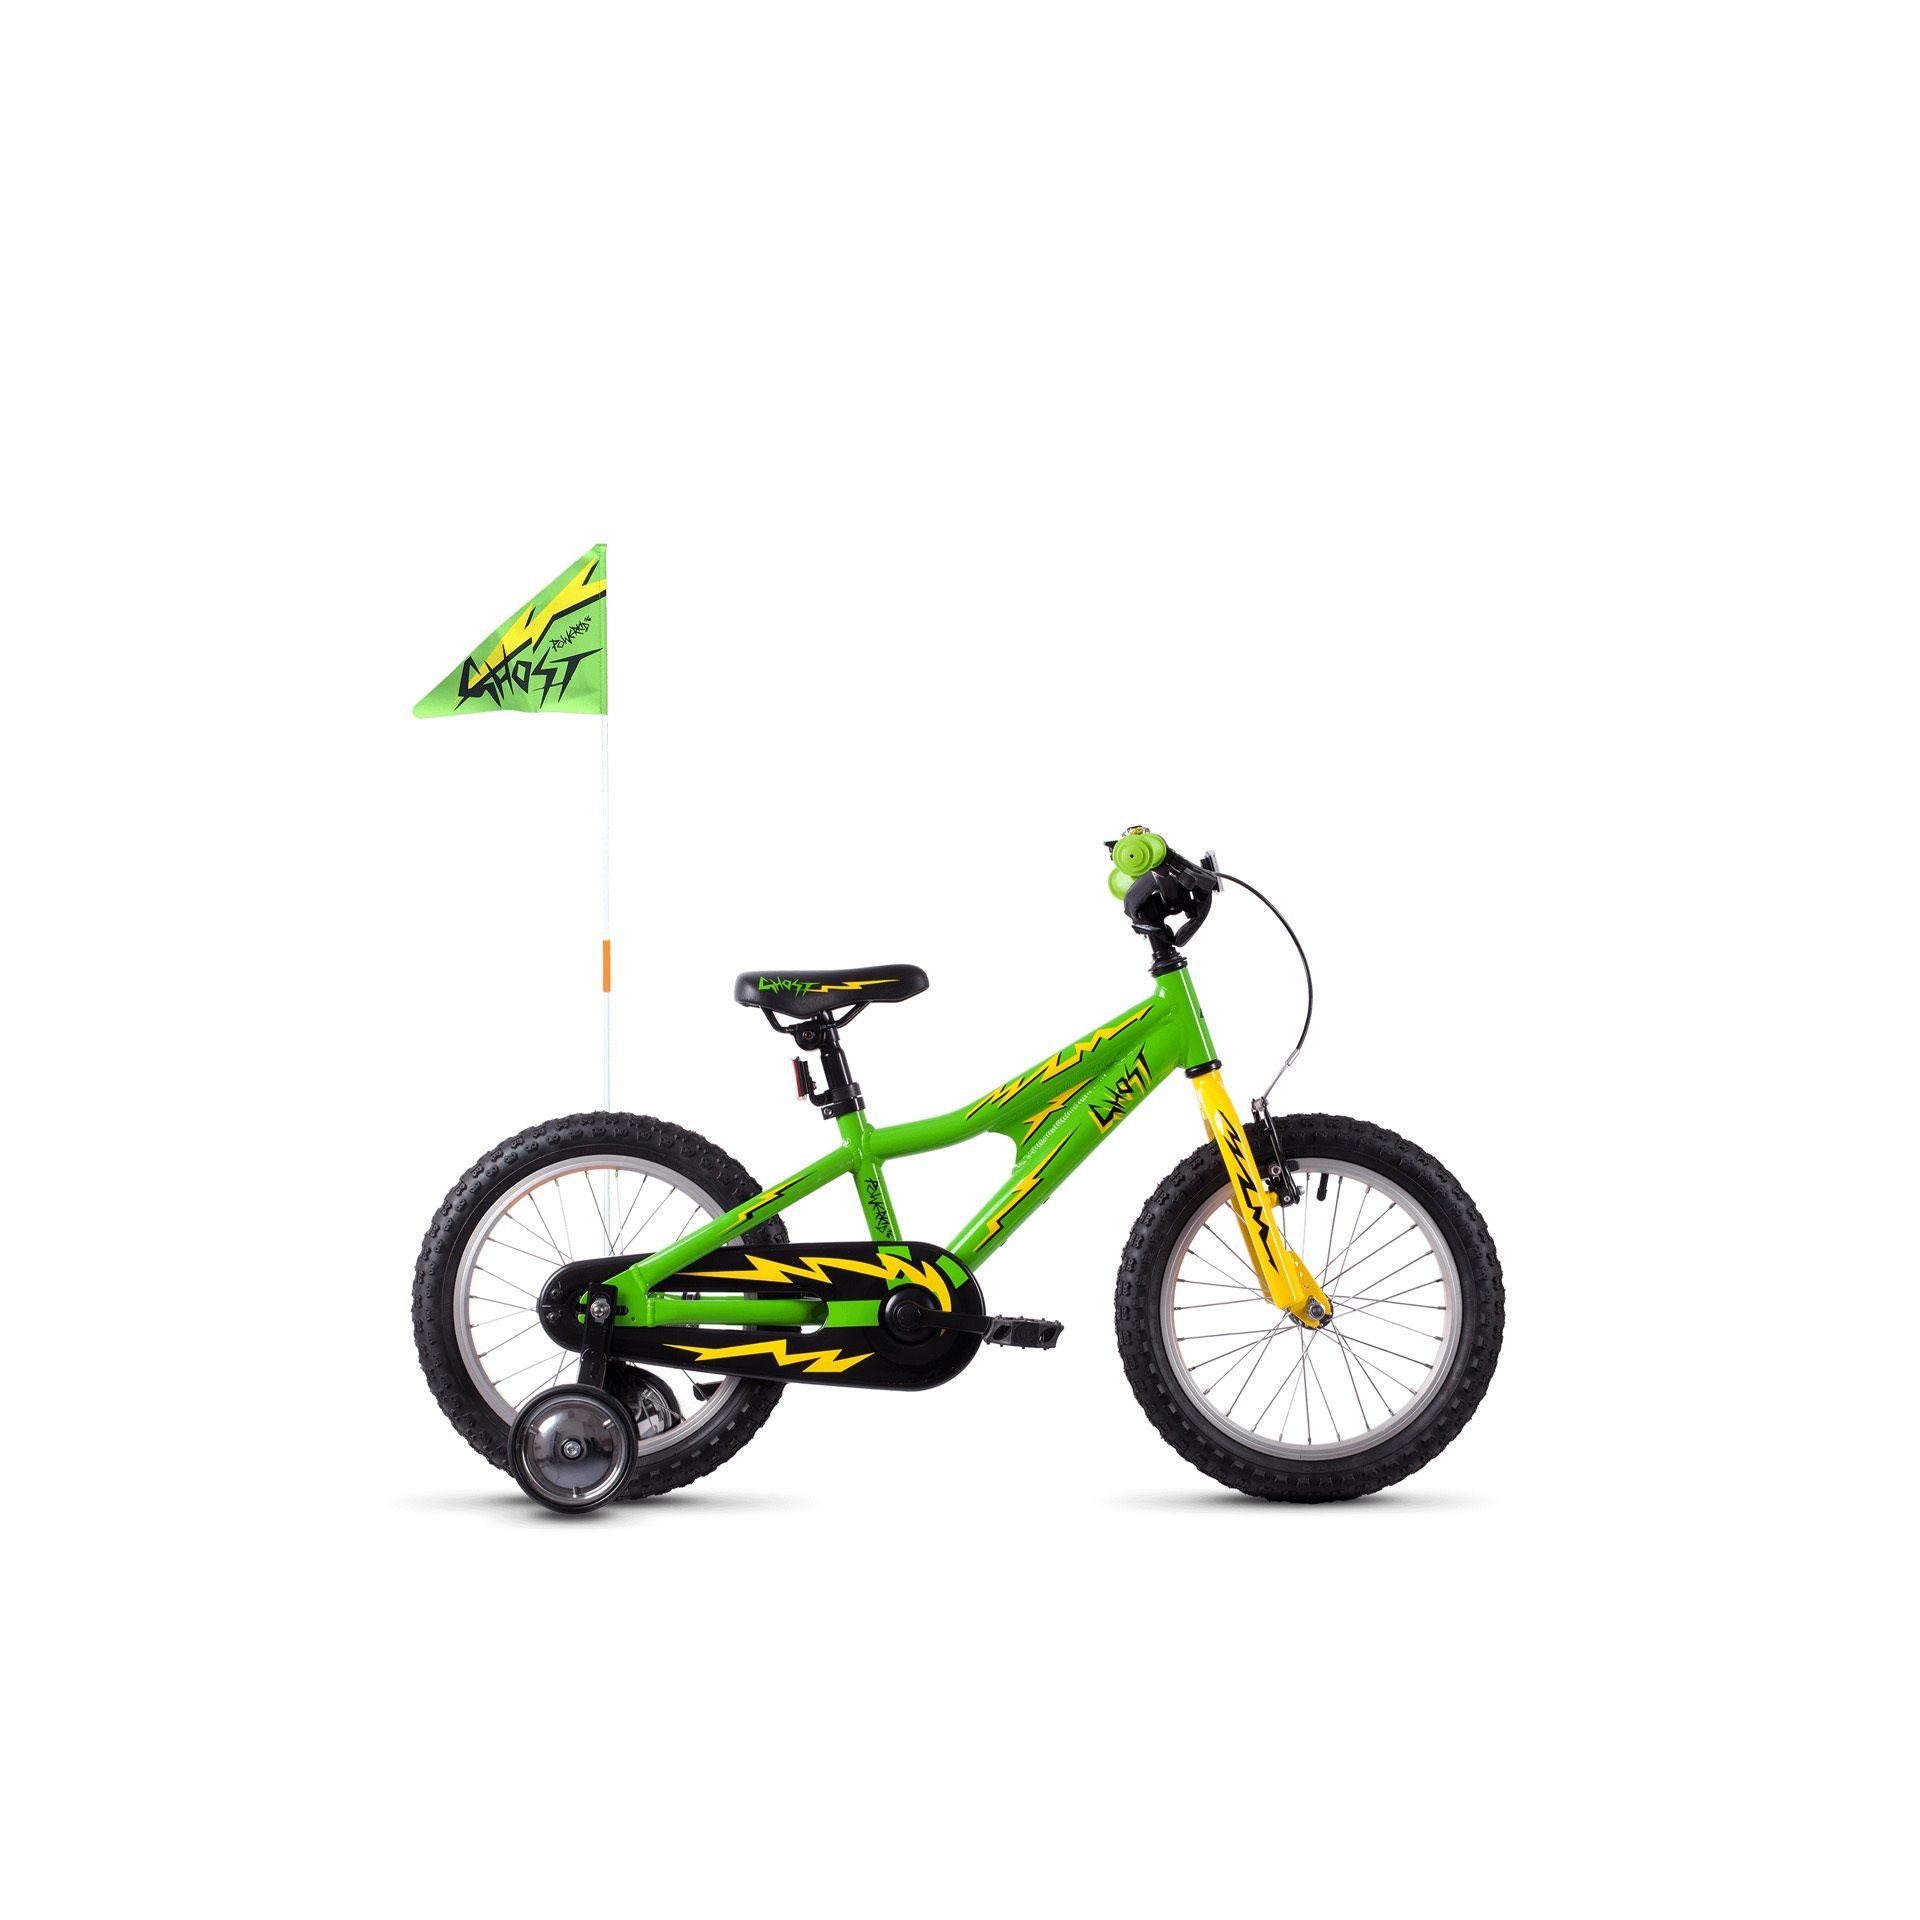 Vélo enfant Ghost Powerkid 16 Vert/Jaune